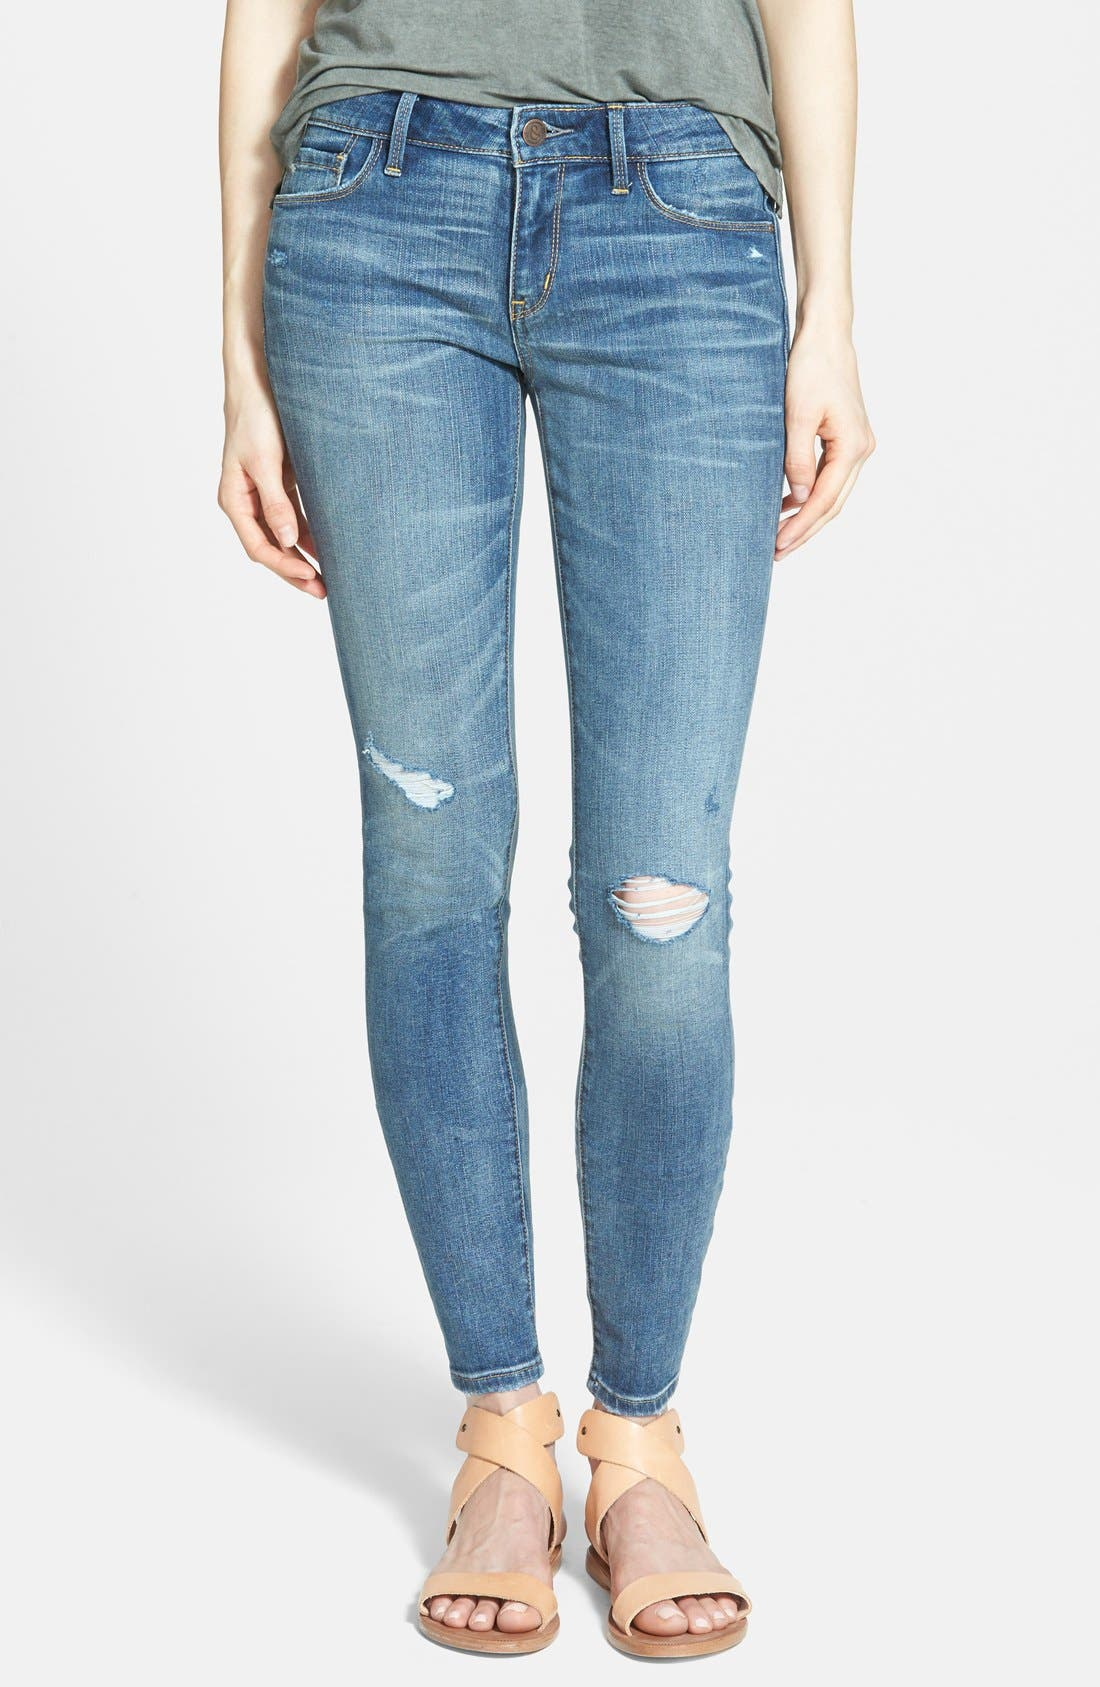 Alternate Image 1 Selected - Treasure&Bond Skinny Jeans (Medium Wash)